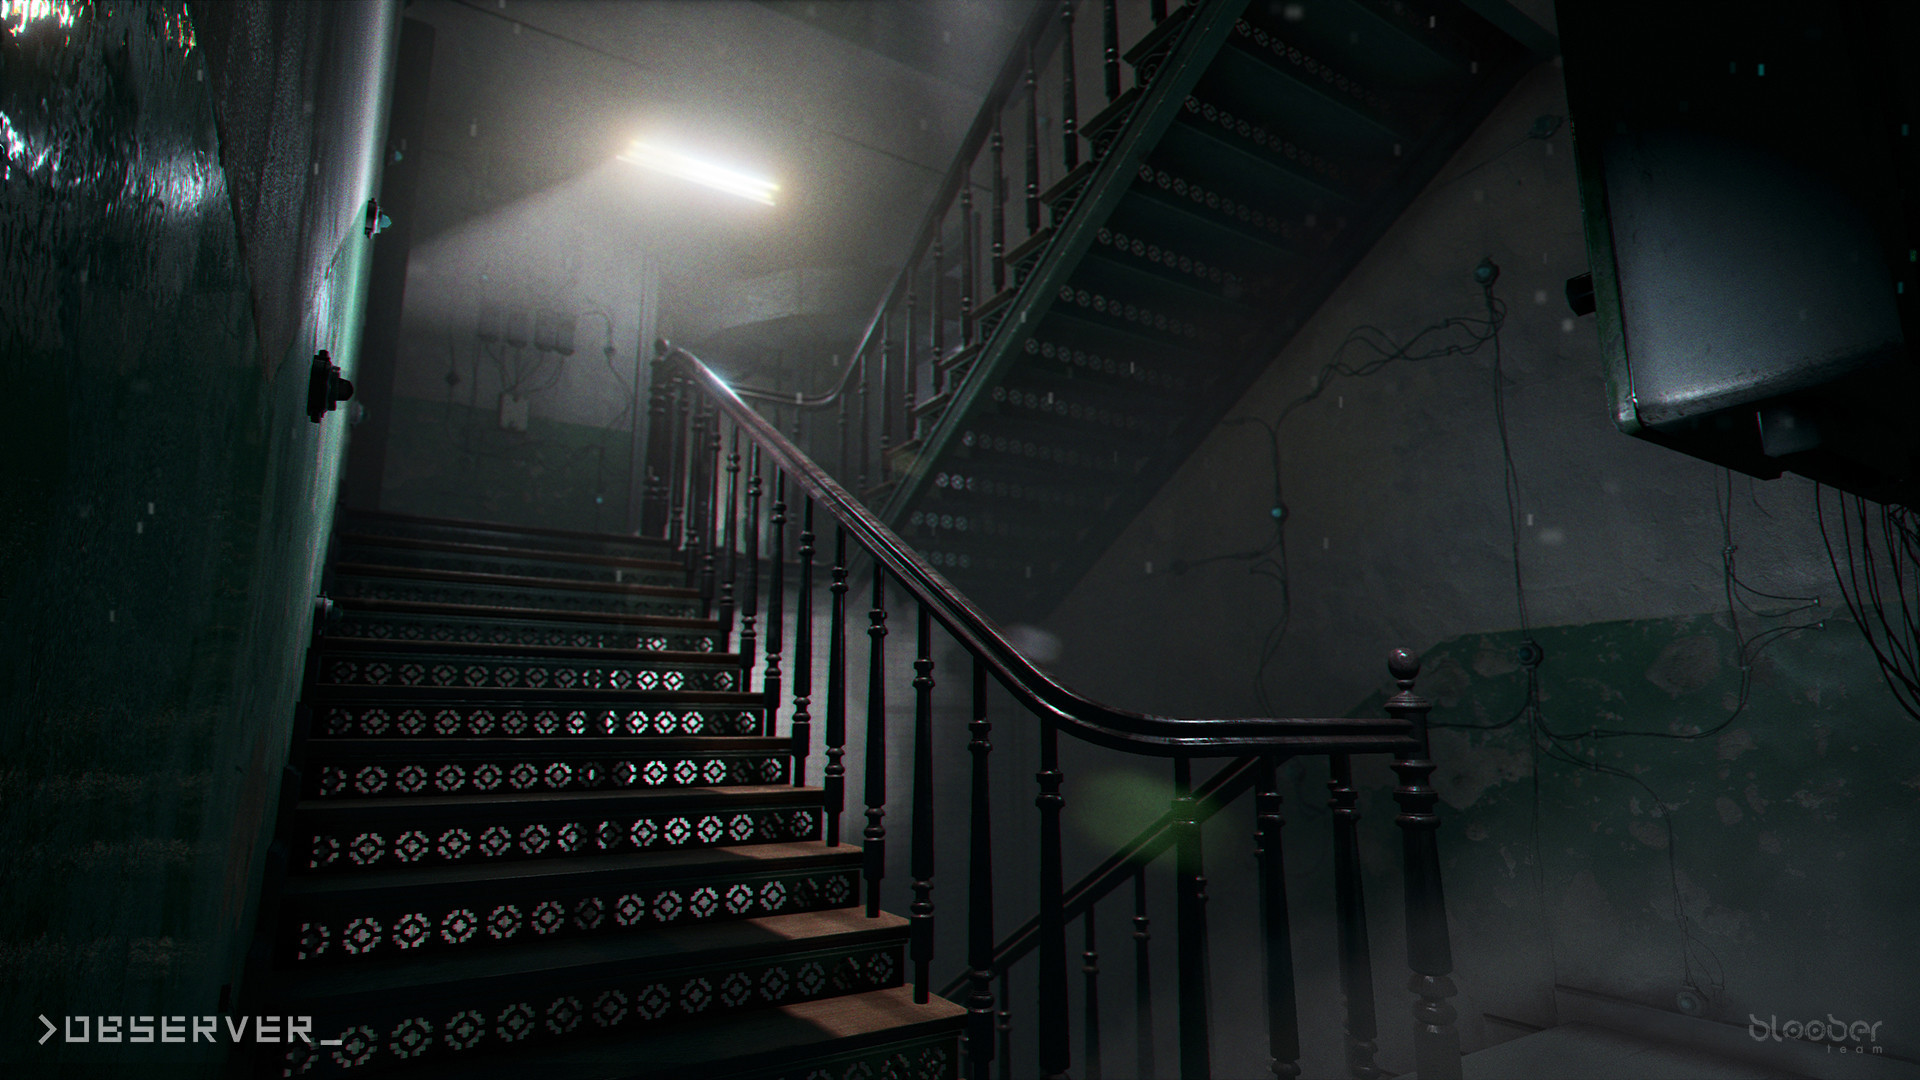 Халява: на PC бесплатно раздают две игры — Alan Wake's American Nightmare и >observer_